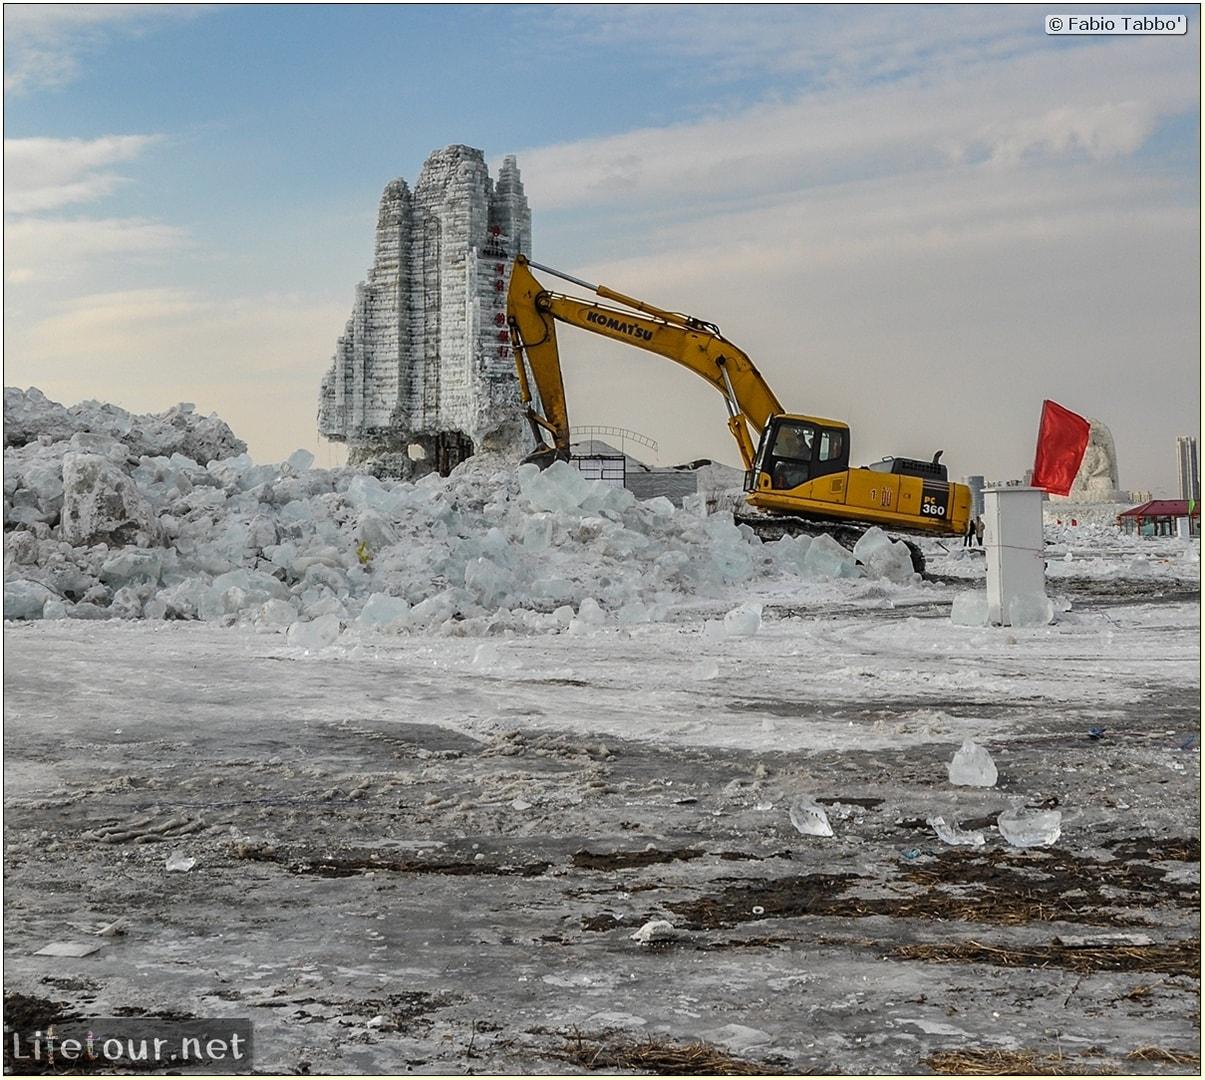 Fabio's LifeTour - China (1993-1997 and 2014) - Harbin (2014) - Ice and Snow show - 4041